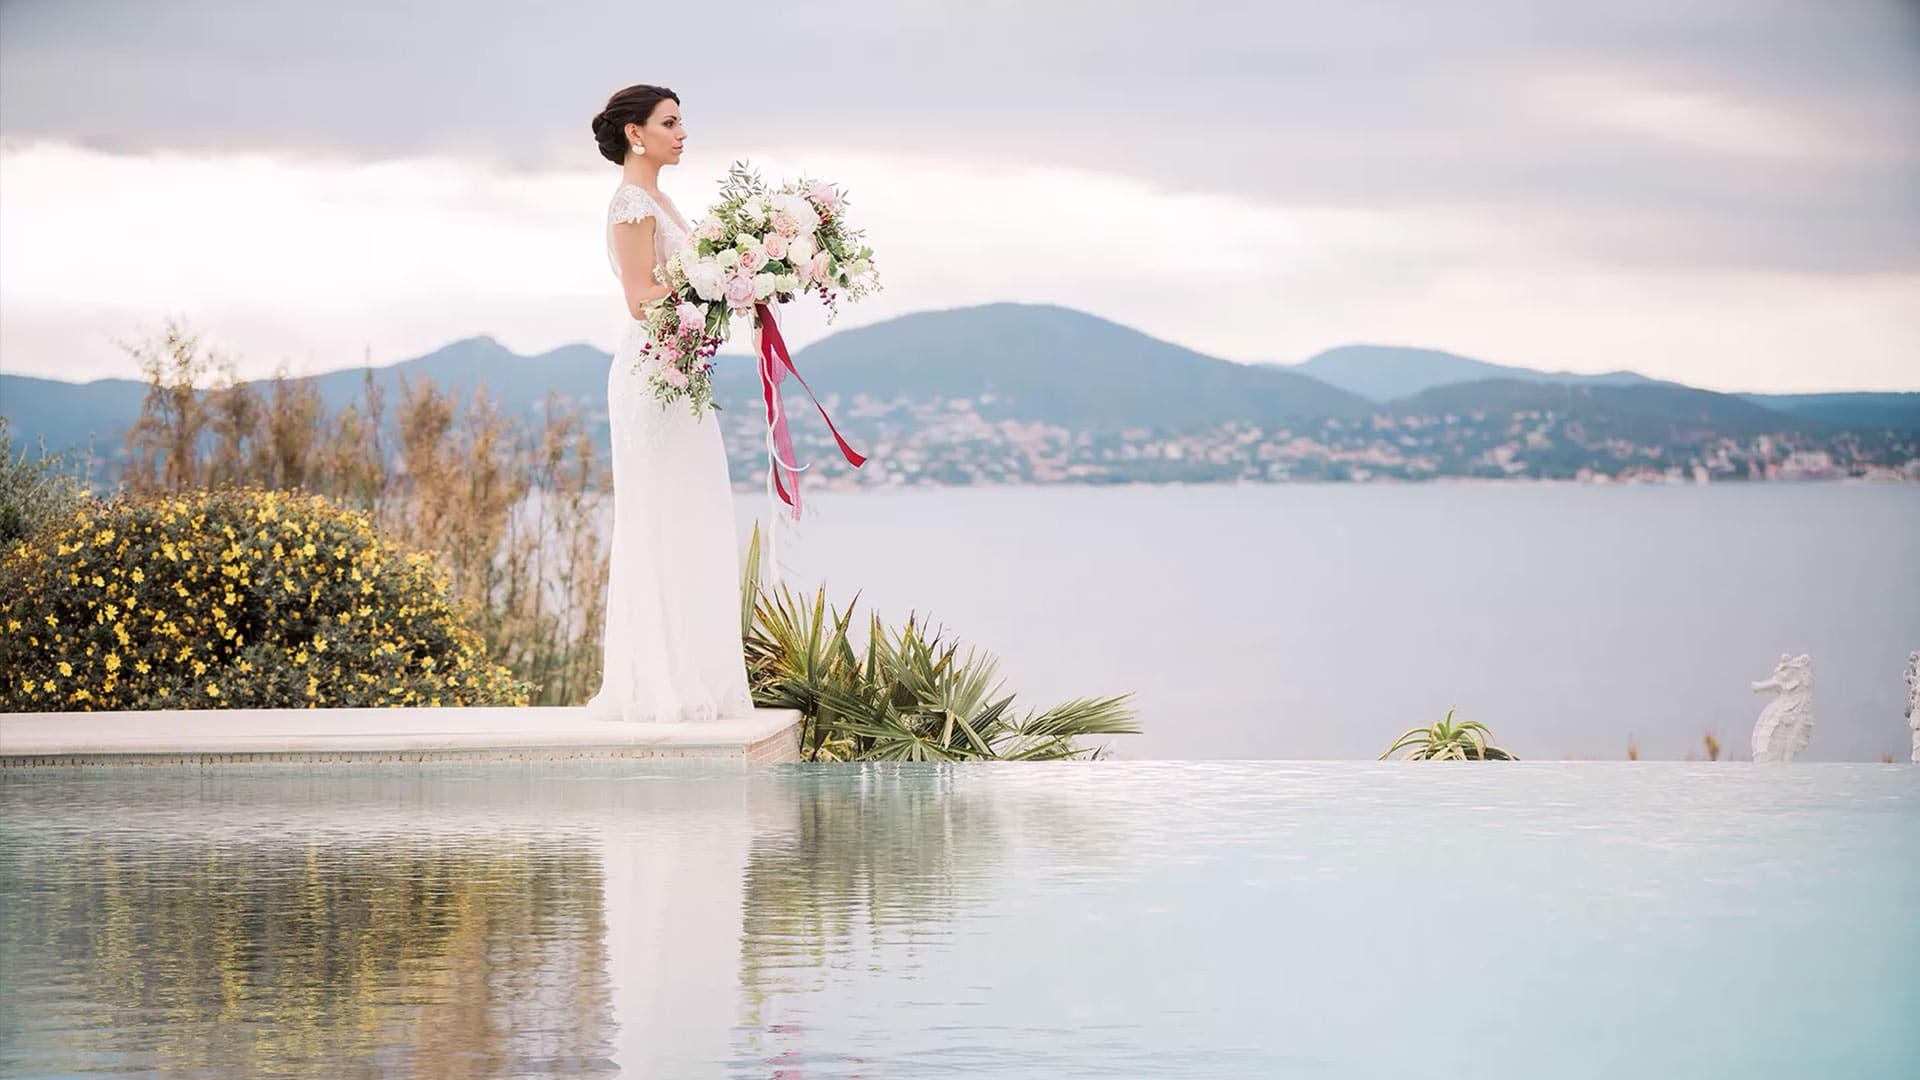 wedding saint tropez pascal canovas photographe